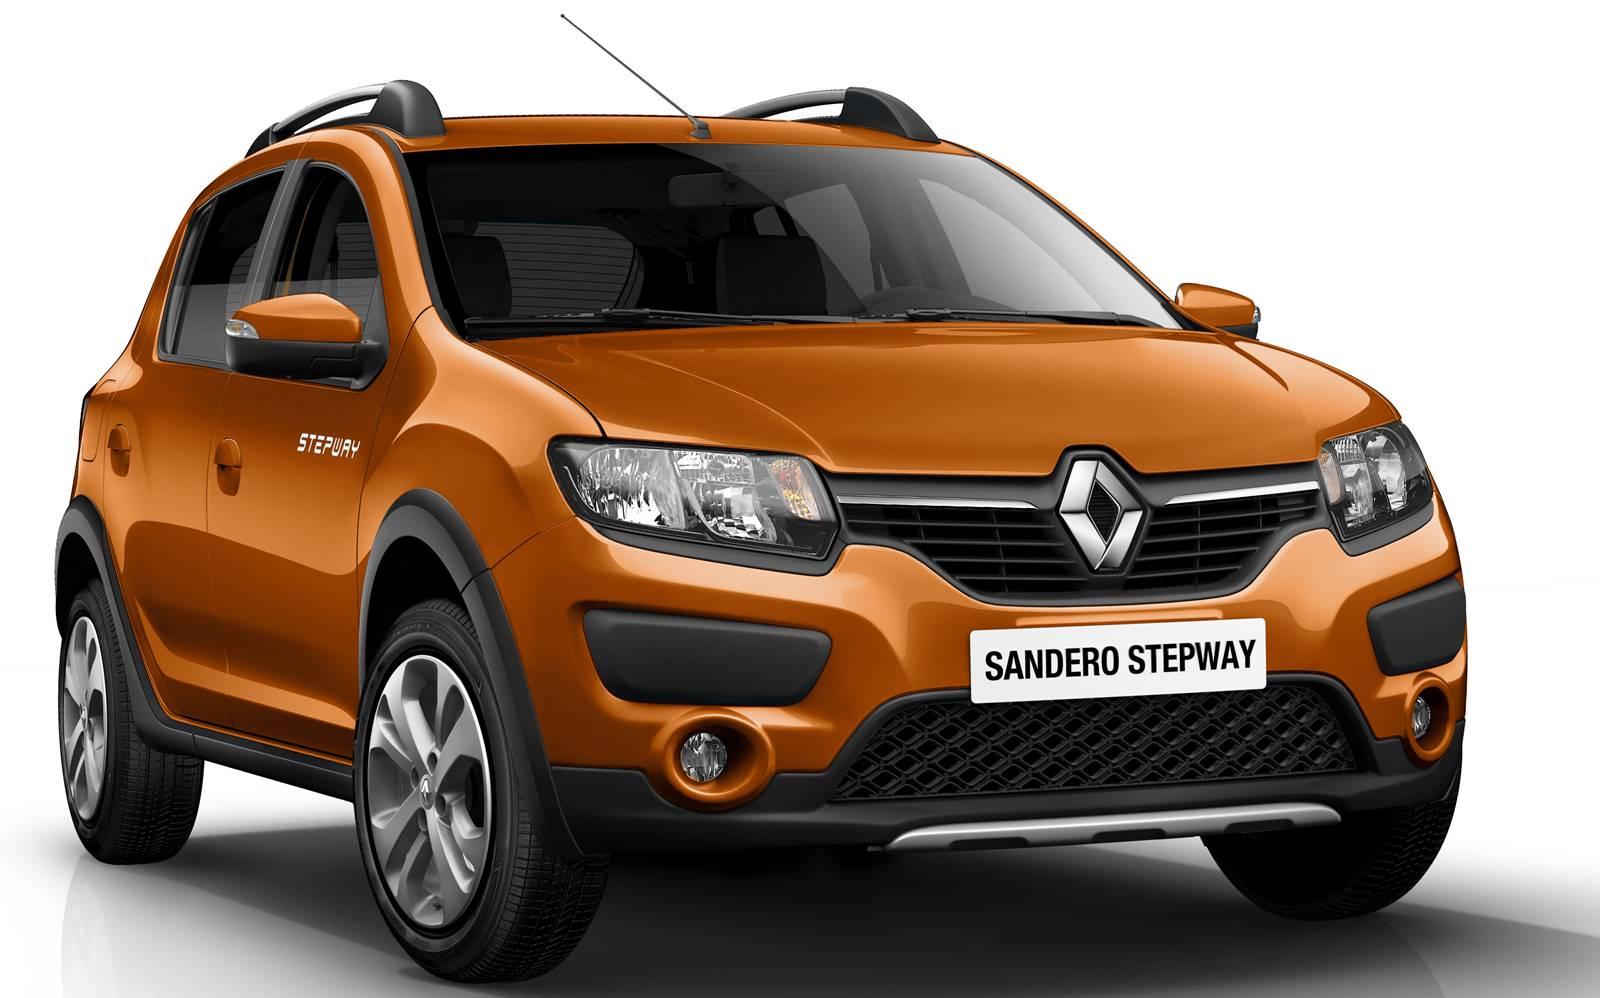 Renault Sandero Stepway 2015 http://www.cantinhojutavares.com